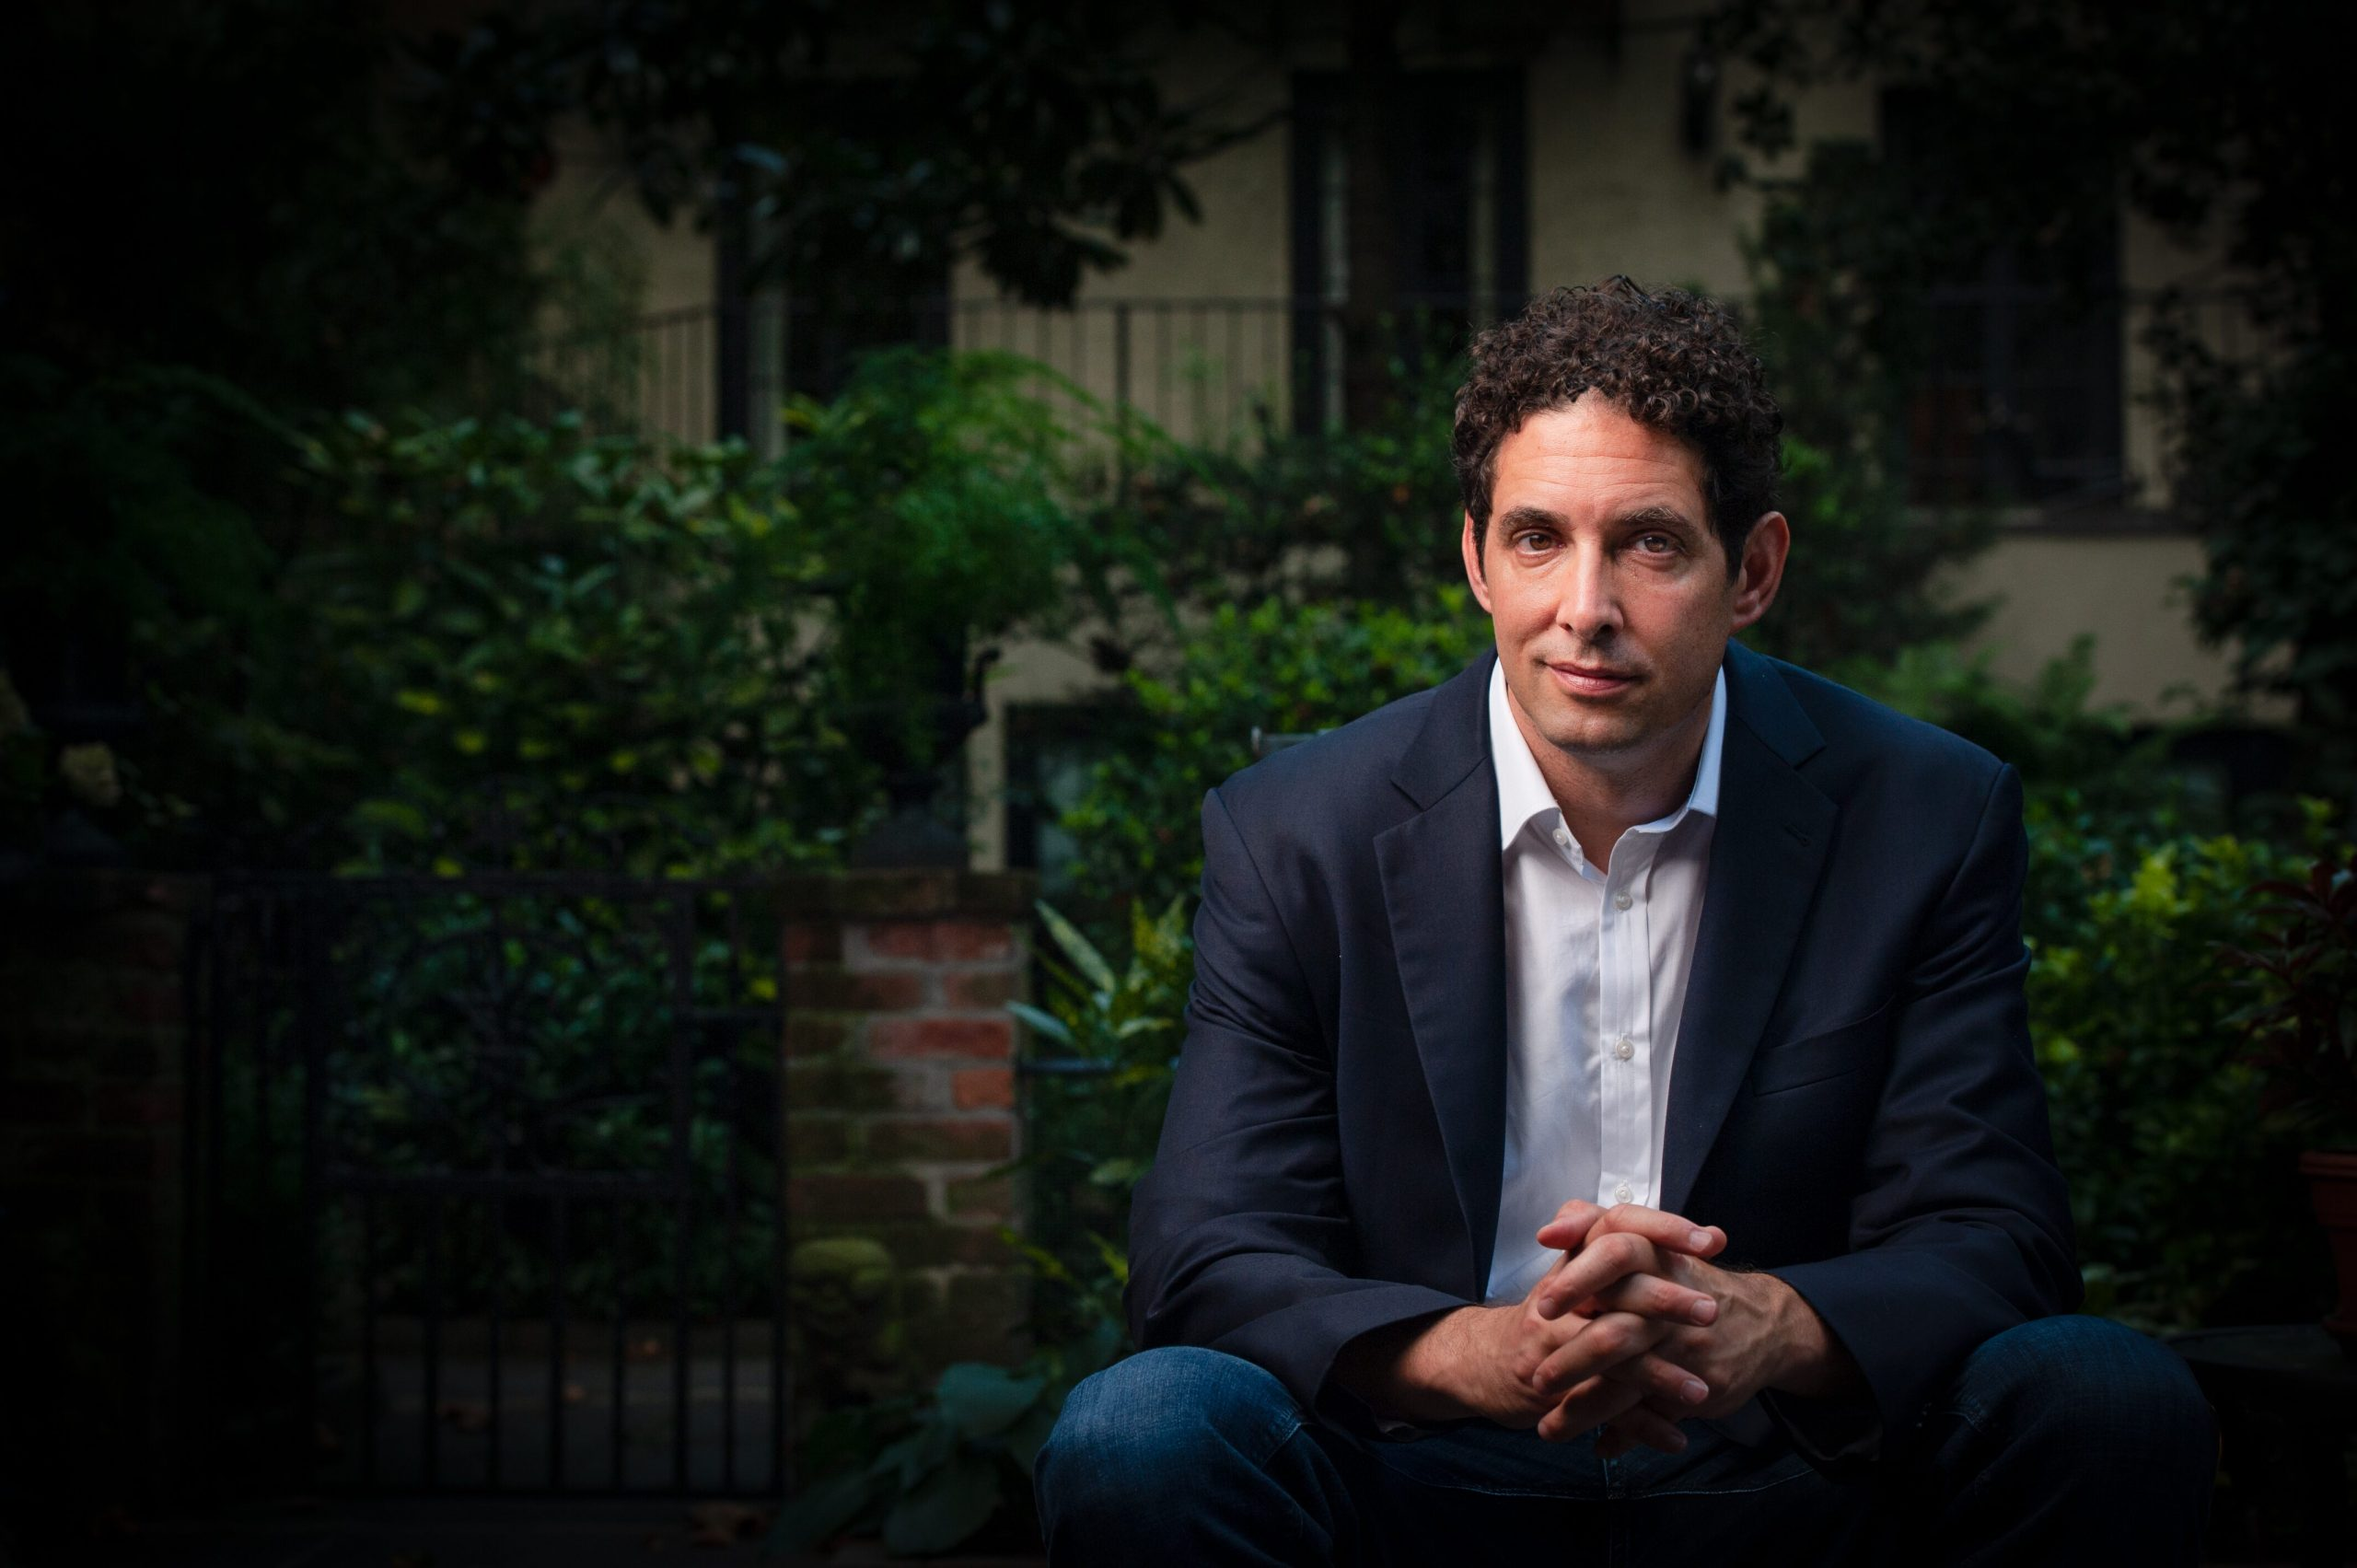 Ex-NYT press reporter Berenson cautions of 'big pivot' from authorities to validate lockdown method